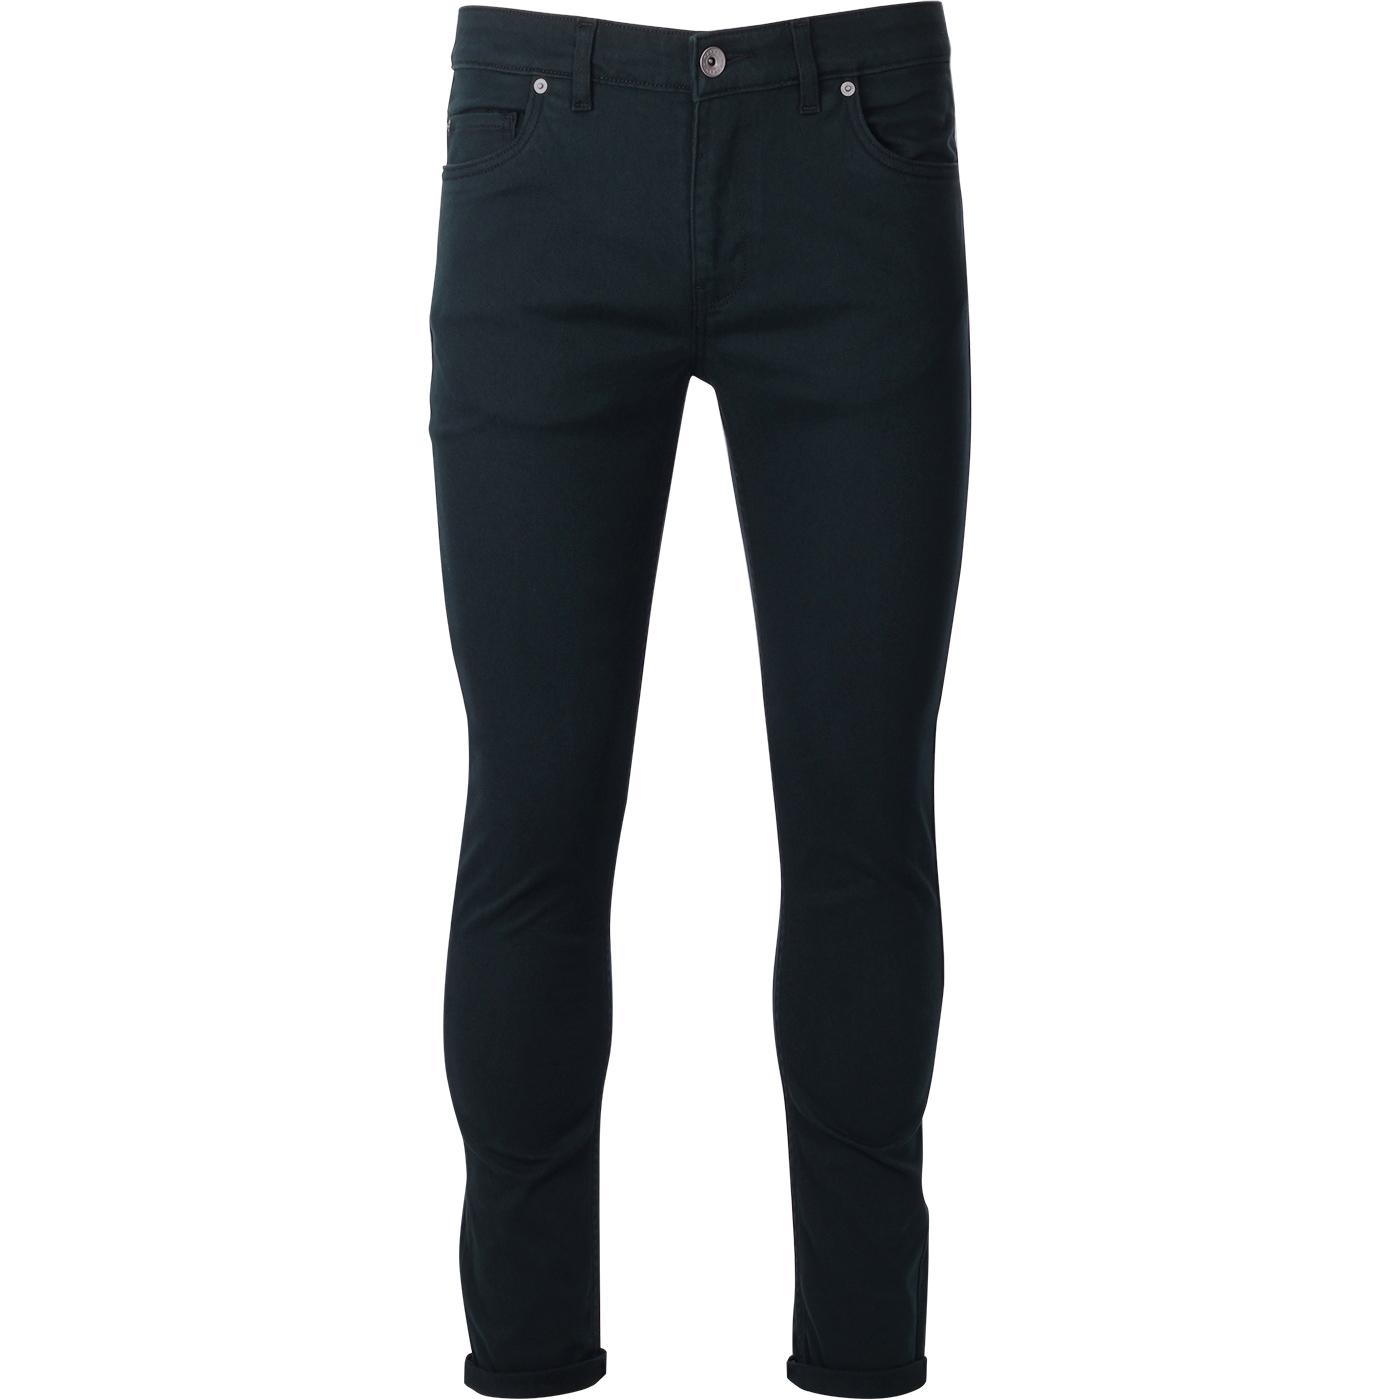 Drake FARAH Retro Mod Twill Chino Trousers (TN)